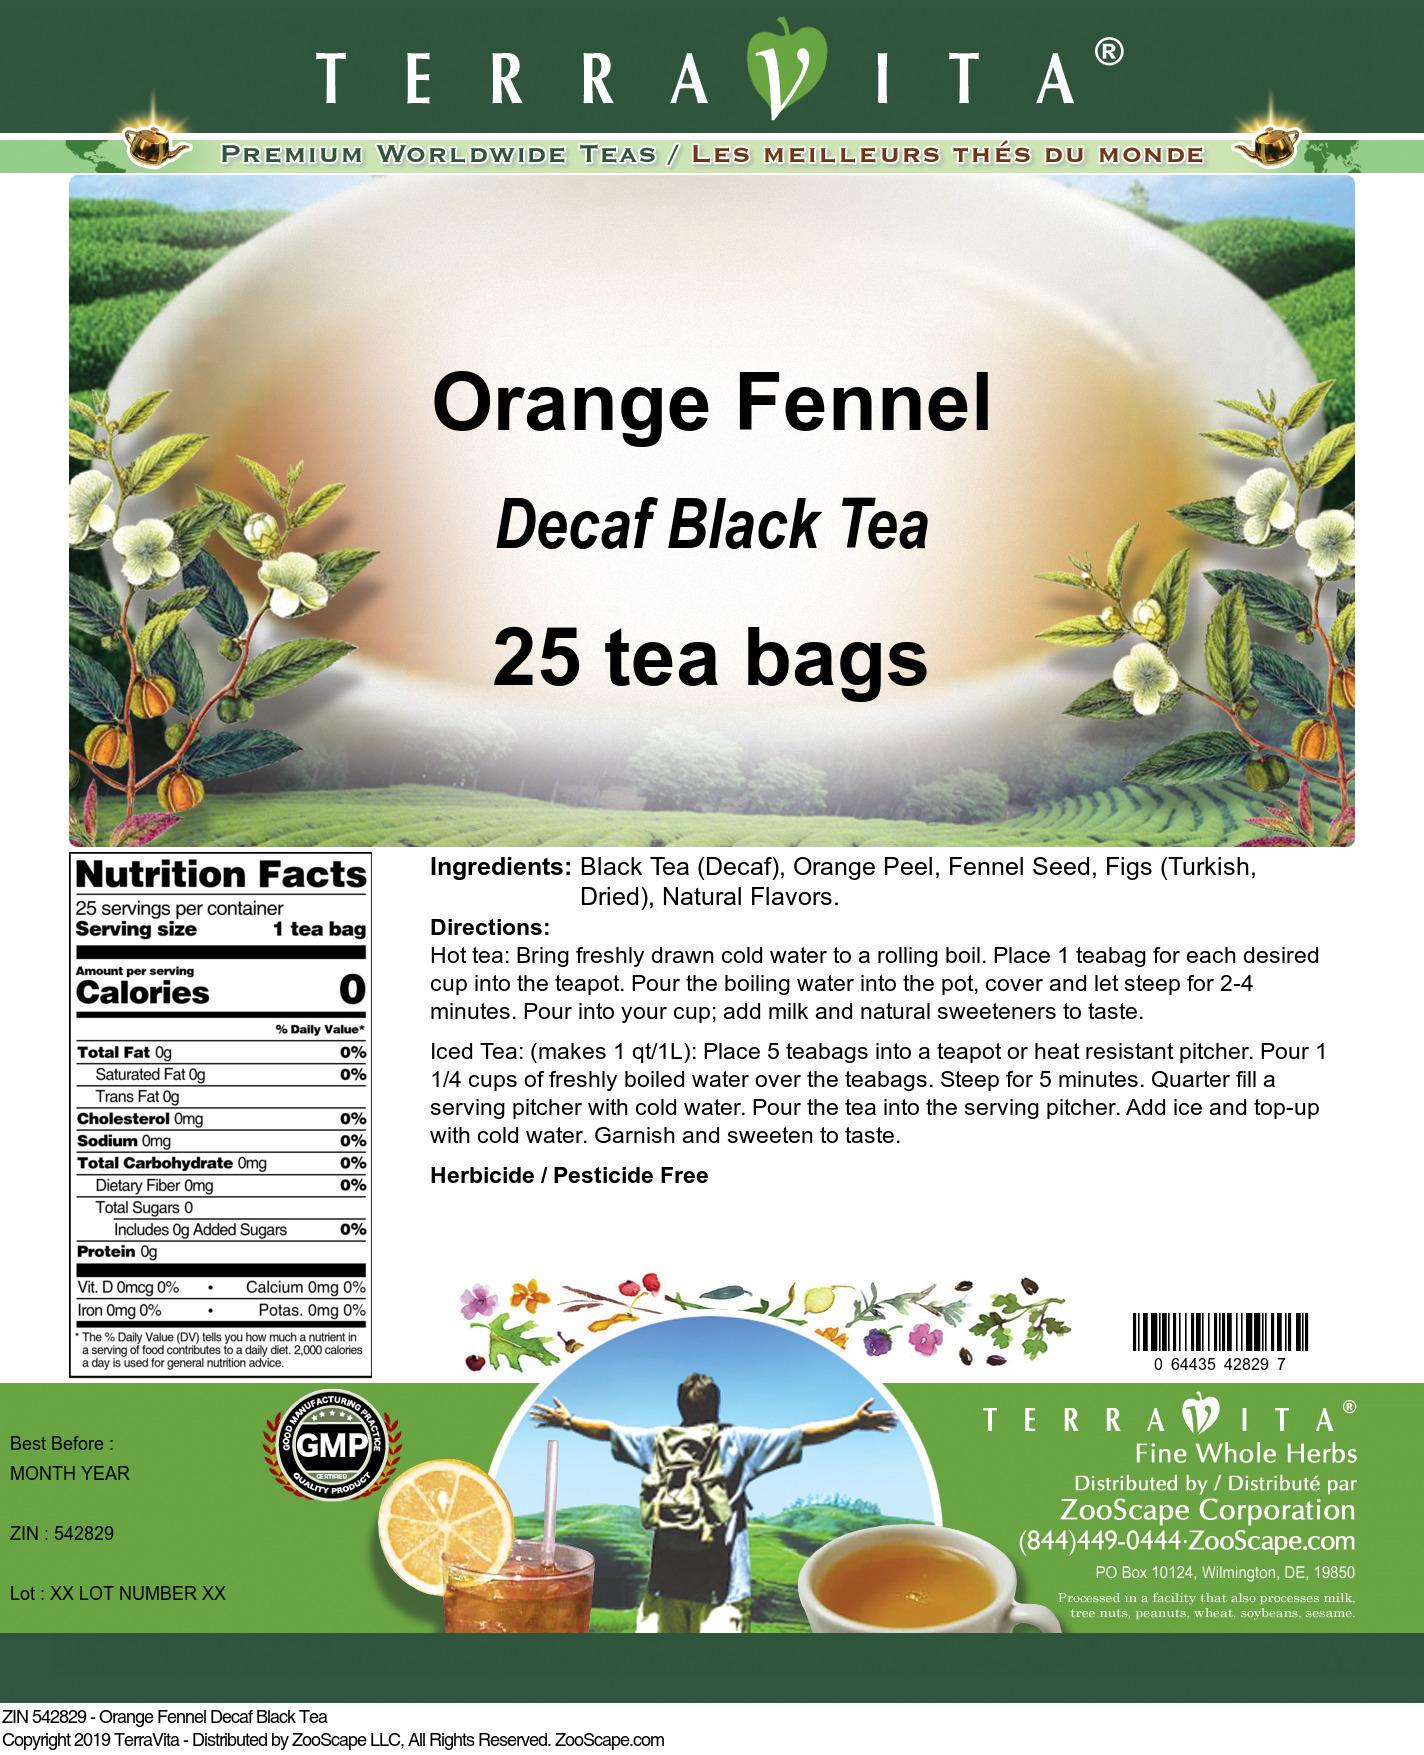 Orange Fennel Decaf Black Tea